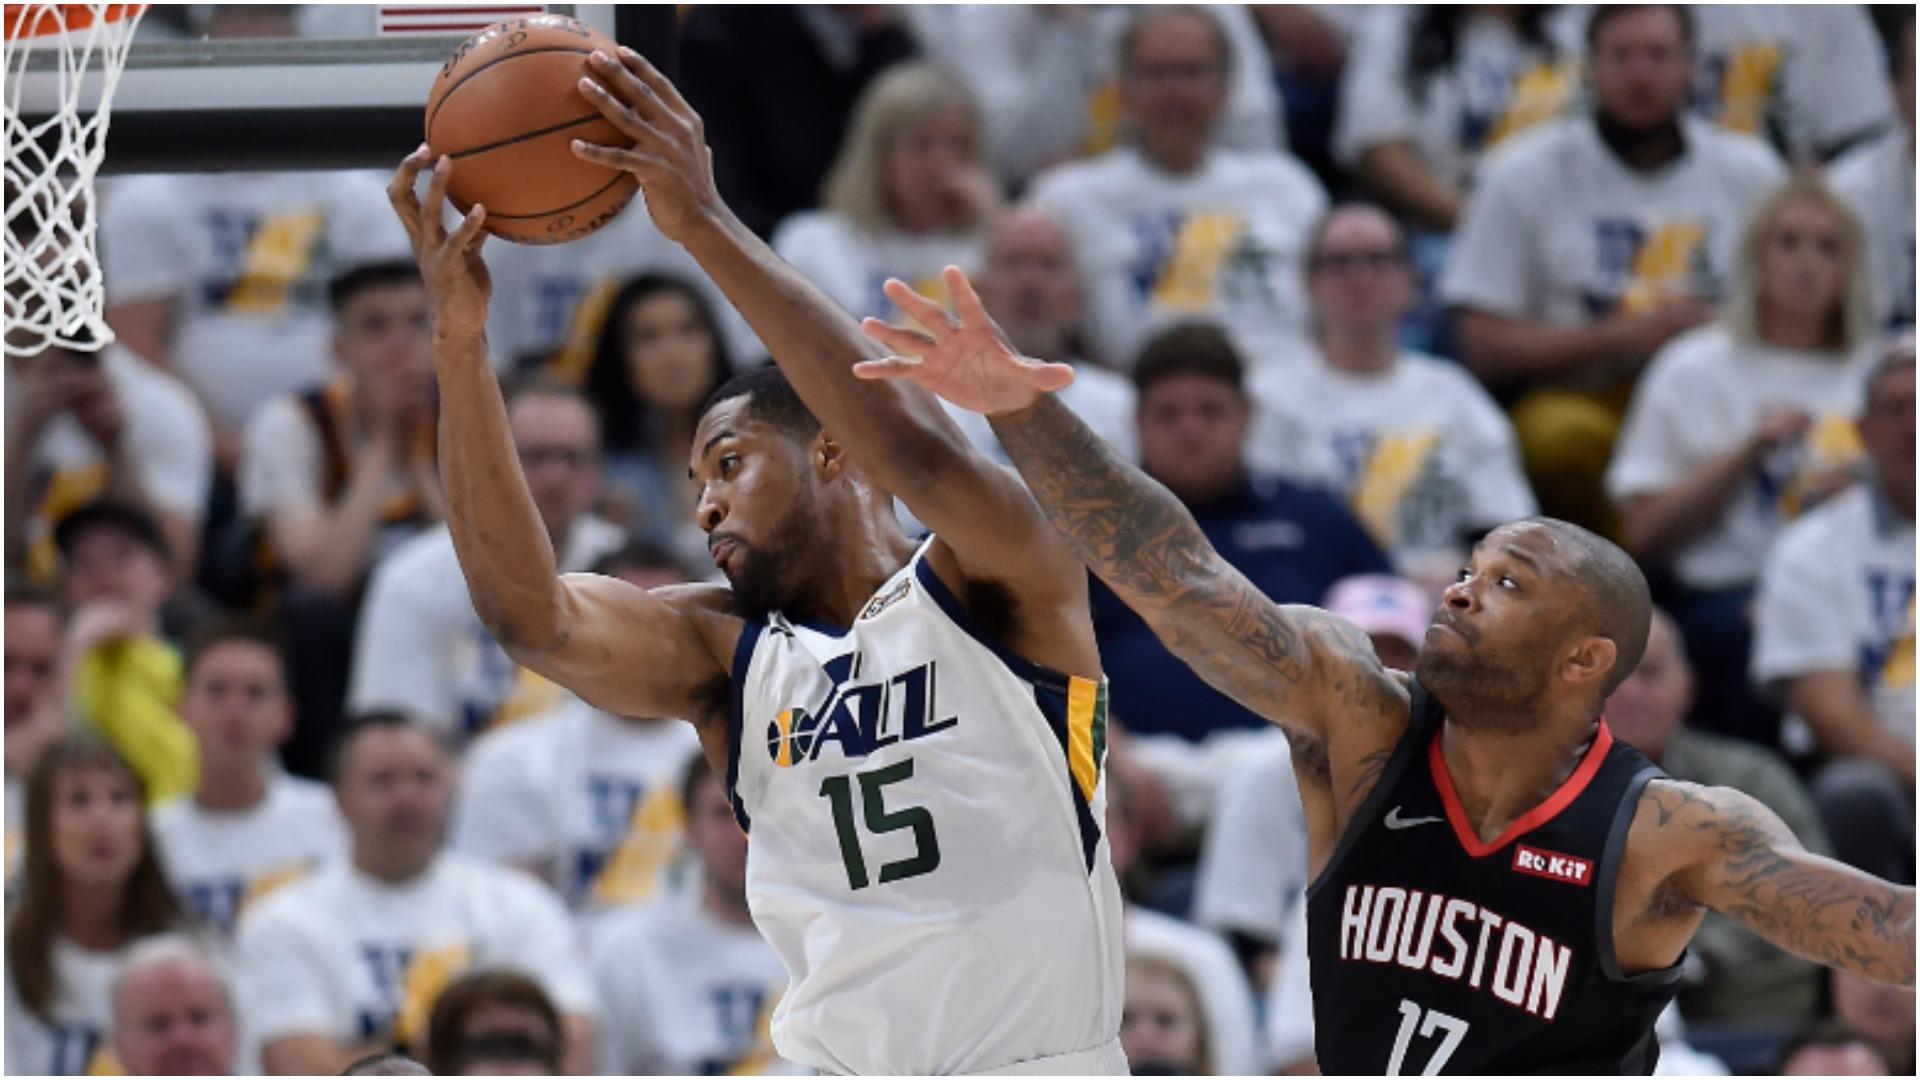 Defending Favors 'draining' for Rockets – Harden